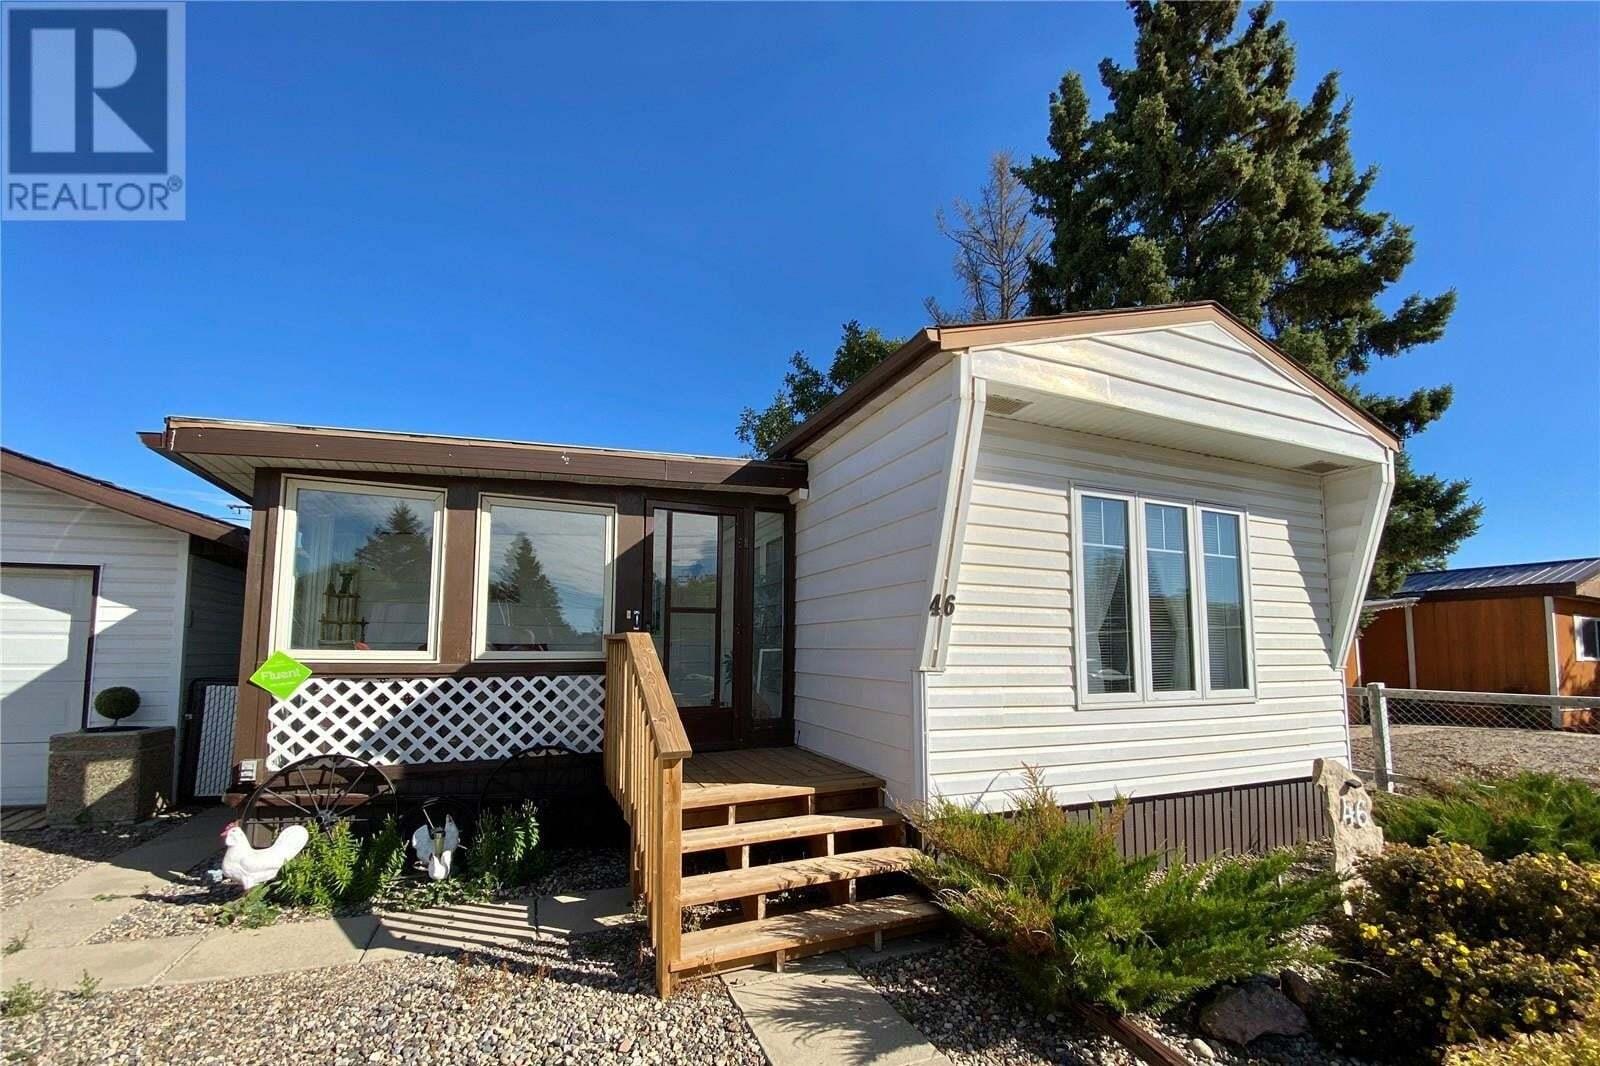 Residential property for sale at 46 Eastview Trailer Ct Prince Albert Rm No. 461 Saskatchewan - MLS: SK826319